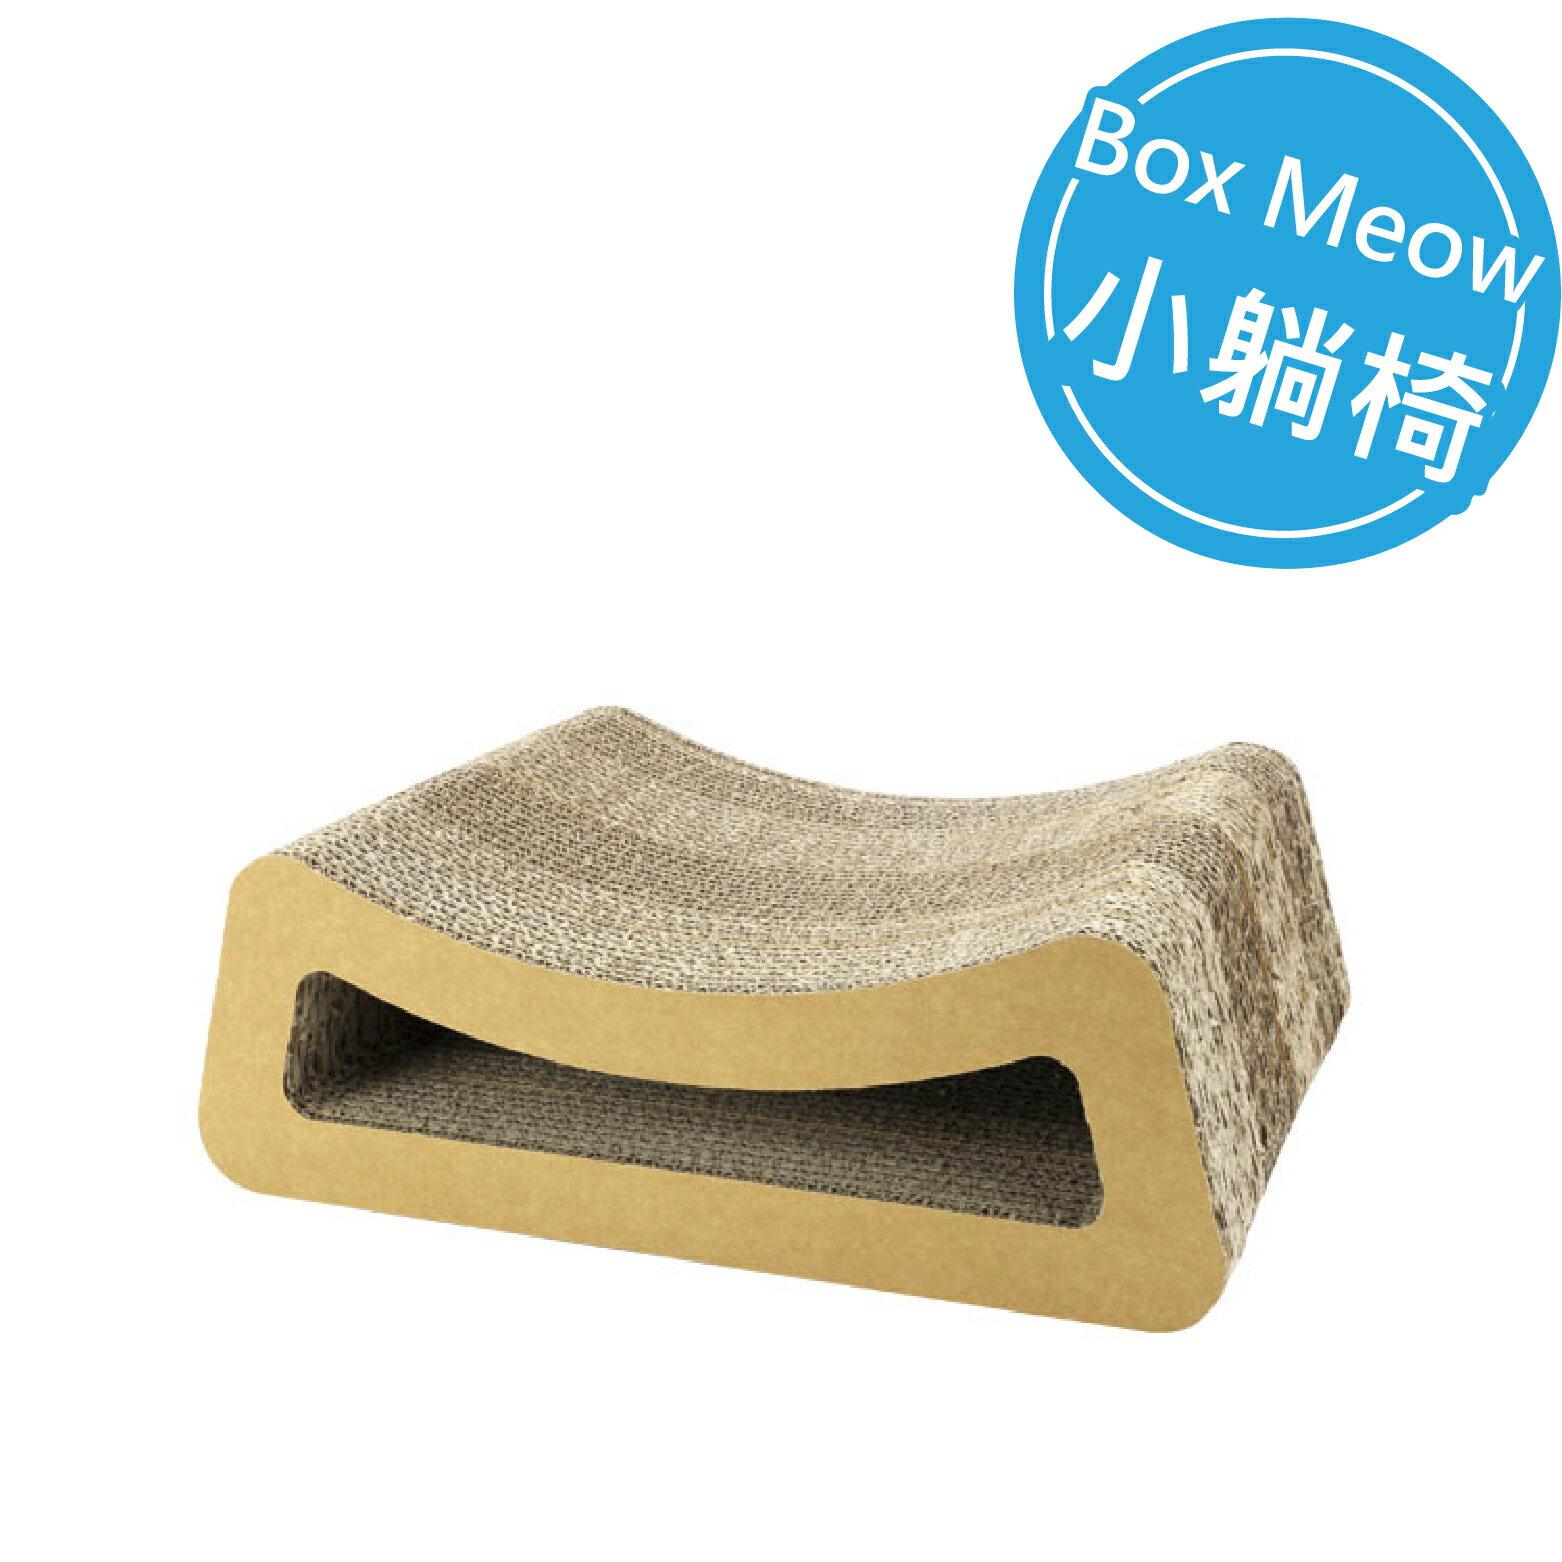 Box Meow瓦楞貓抓板 小躺椅(2入一組) (CS012)